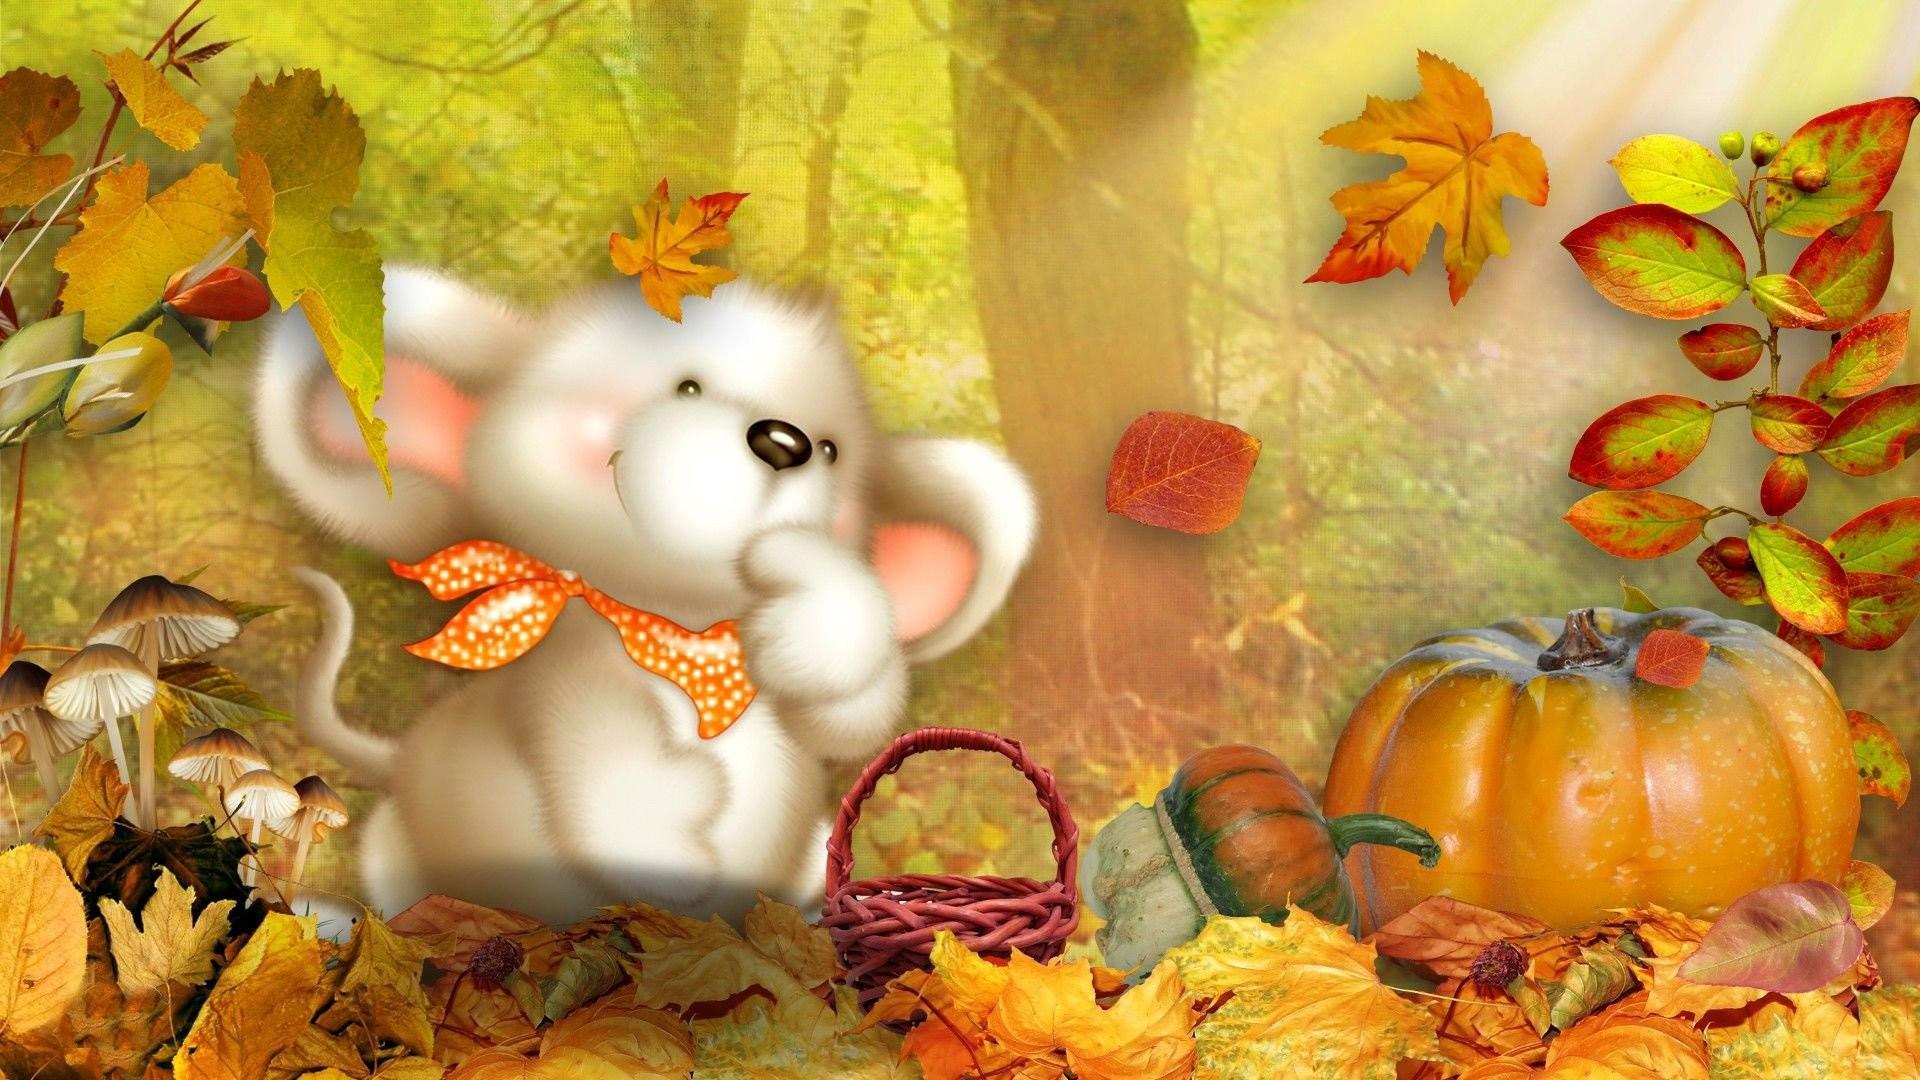 Fluffy Dog In An Autumn Scene Wallpaper – WallDevil